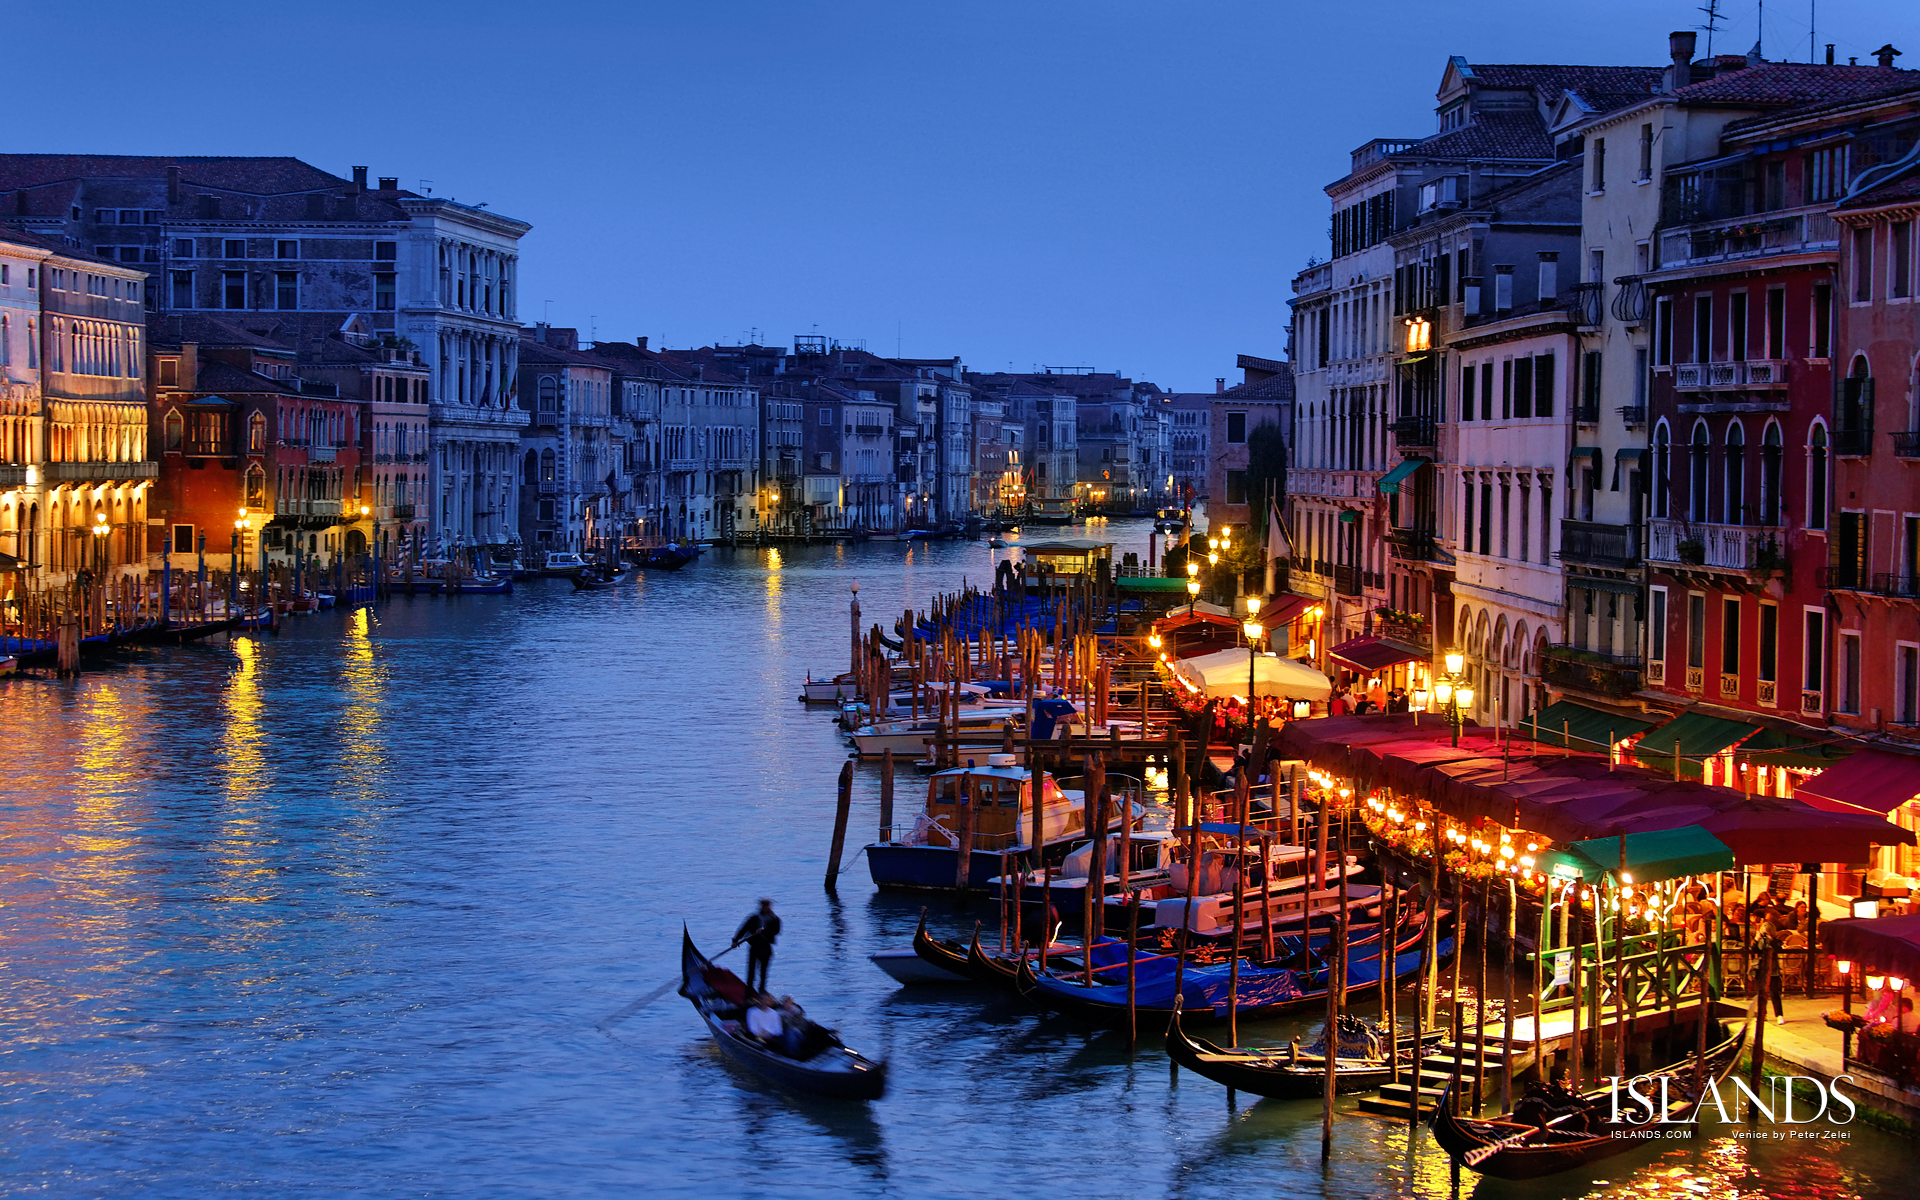 Venice Italy Wallpaper Desktop PC Wallpaper with 1920x1200 Resolution 1920x1200